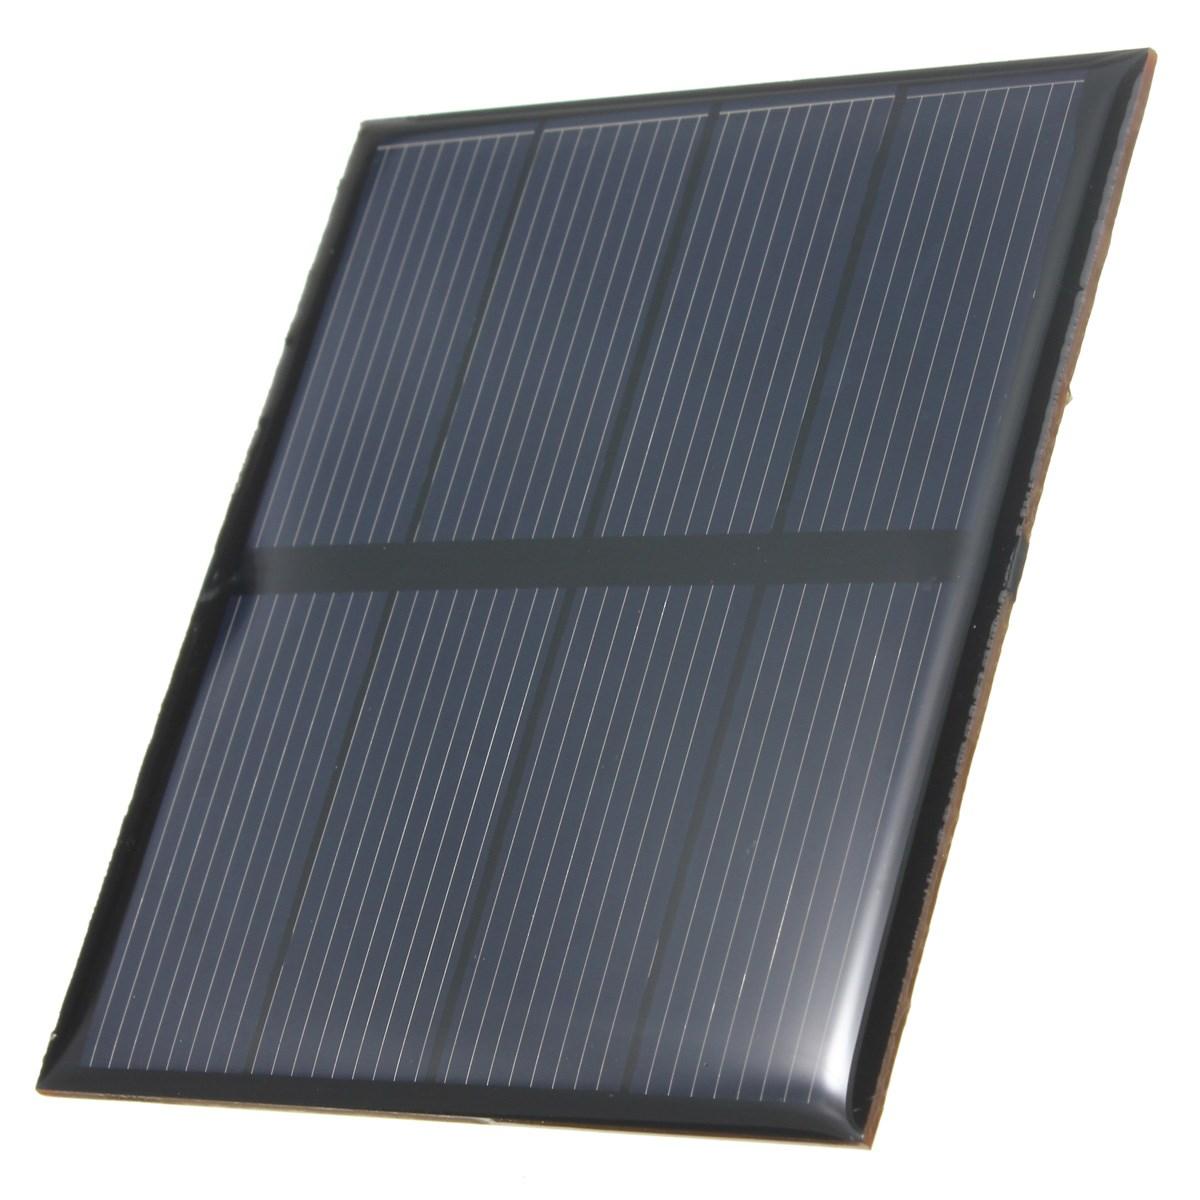 Hot Sale 2V 0.6W 300mAh Polycrystalline Silicon Epoxy Solar Panel Mini Solar Cells DIY Solar Module Stored Energy Power(China (Mainland))